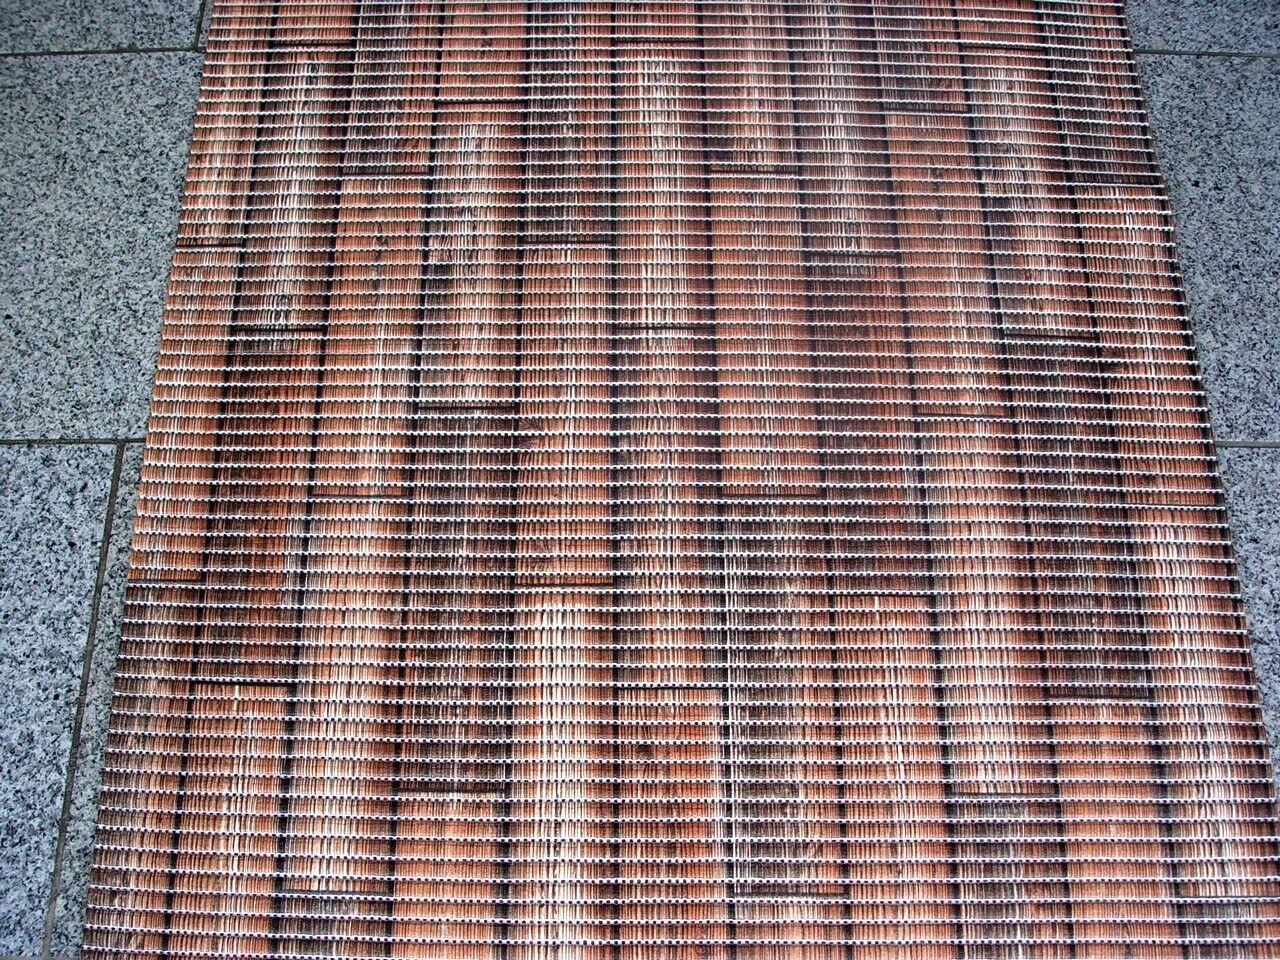 Bodenmatte Fussmatte Weichschaummatte Bodenbelag Universalmatte Riverside